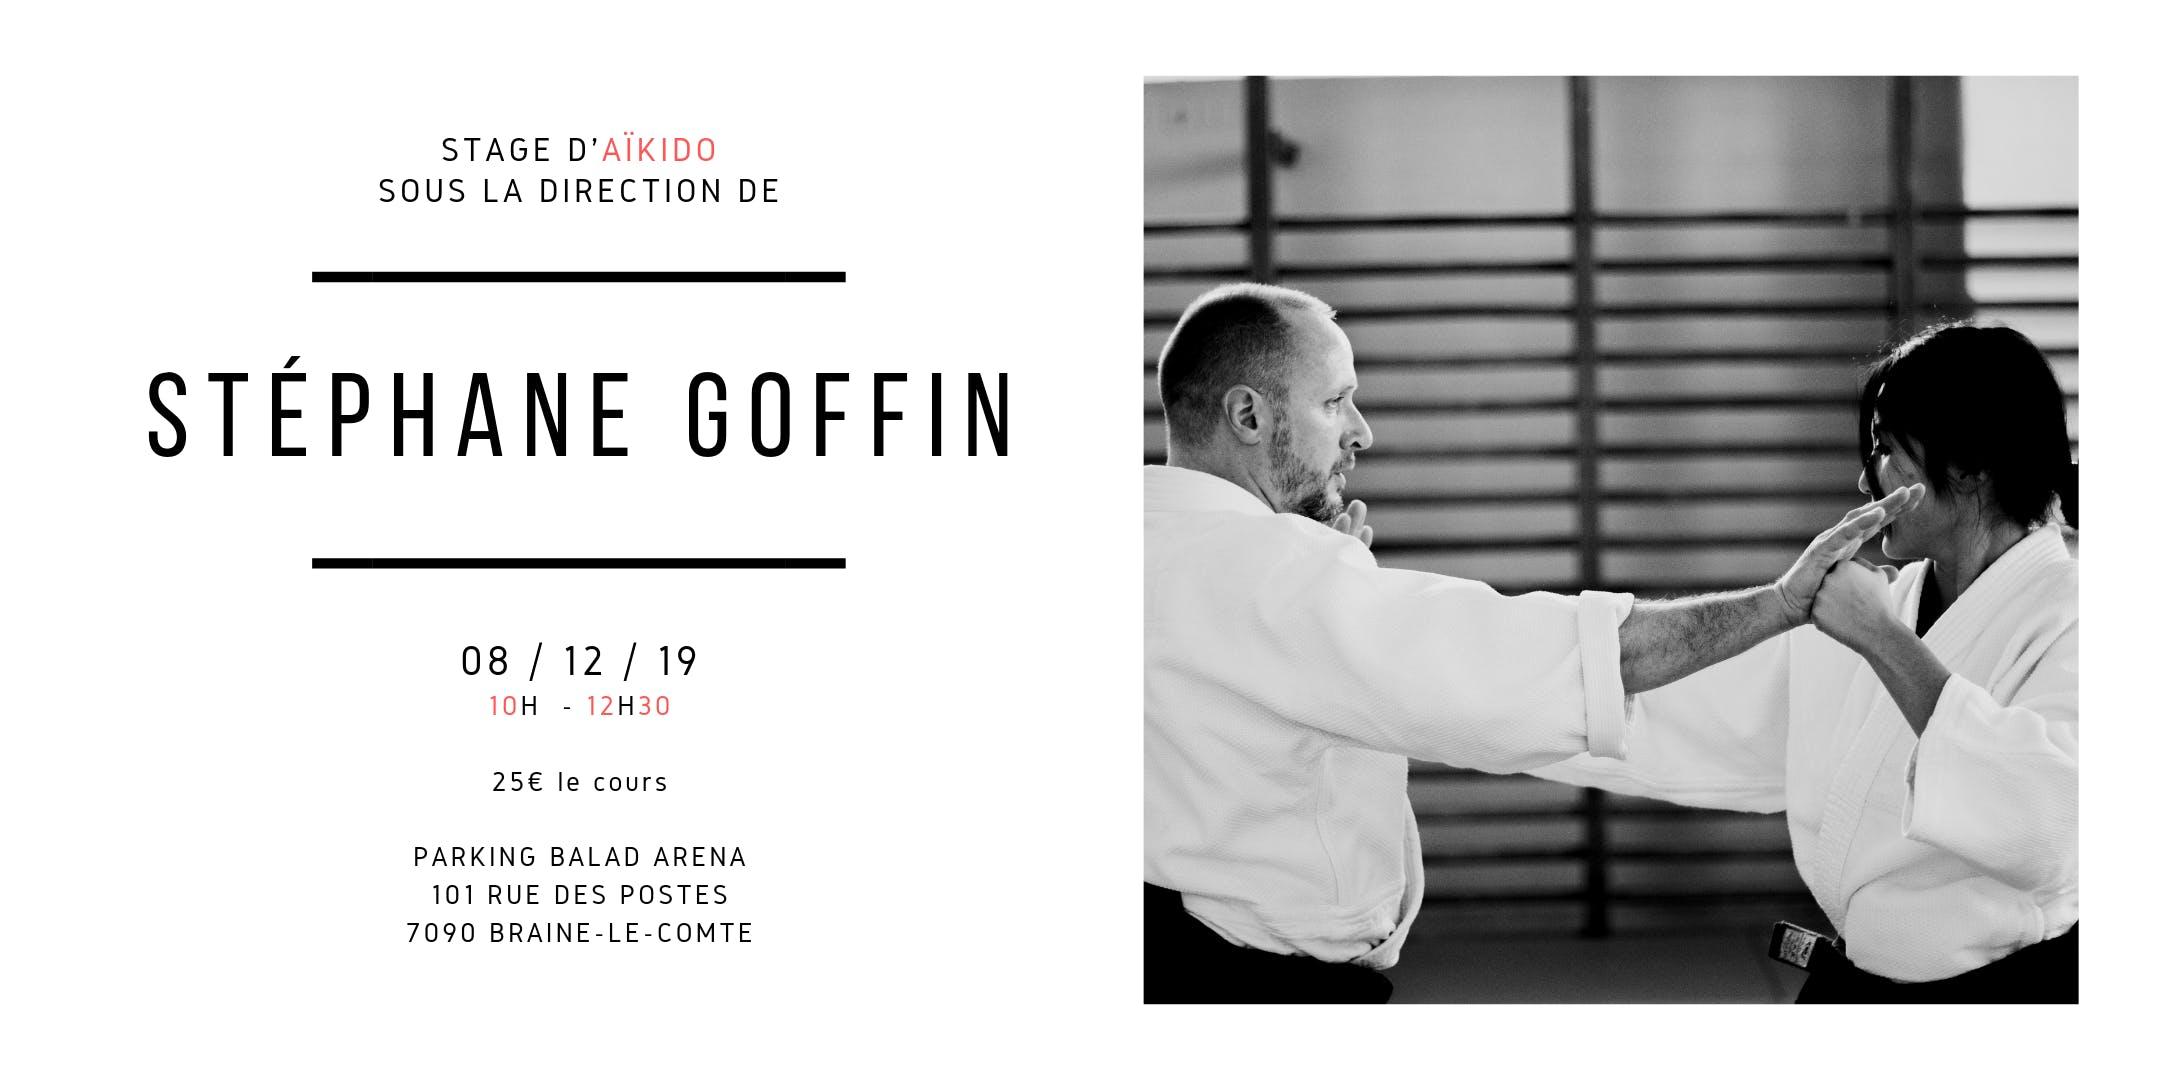 Stage d'Aïkido de Stéphane Goffin au Togishi Dojo